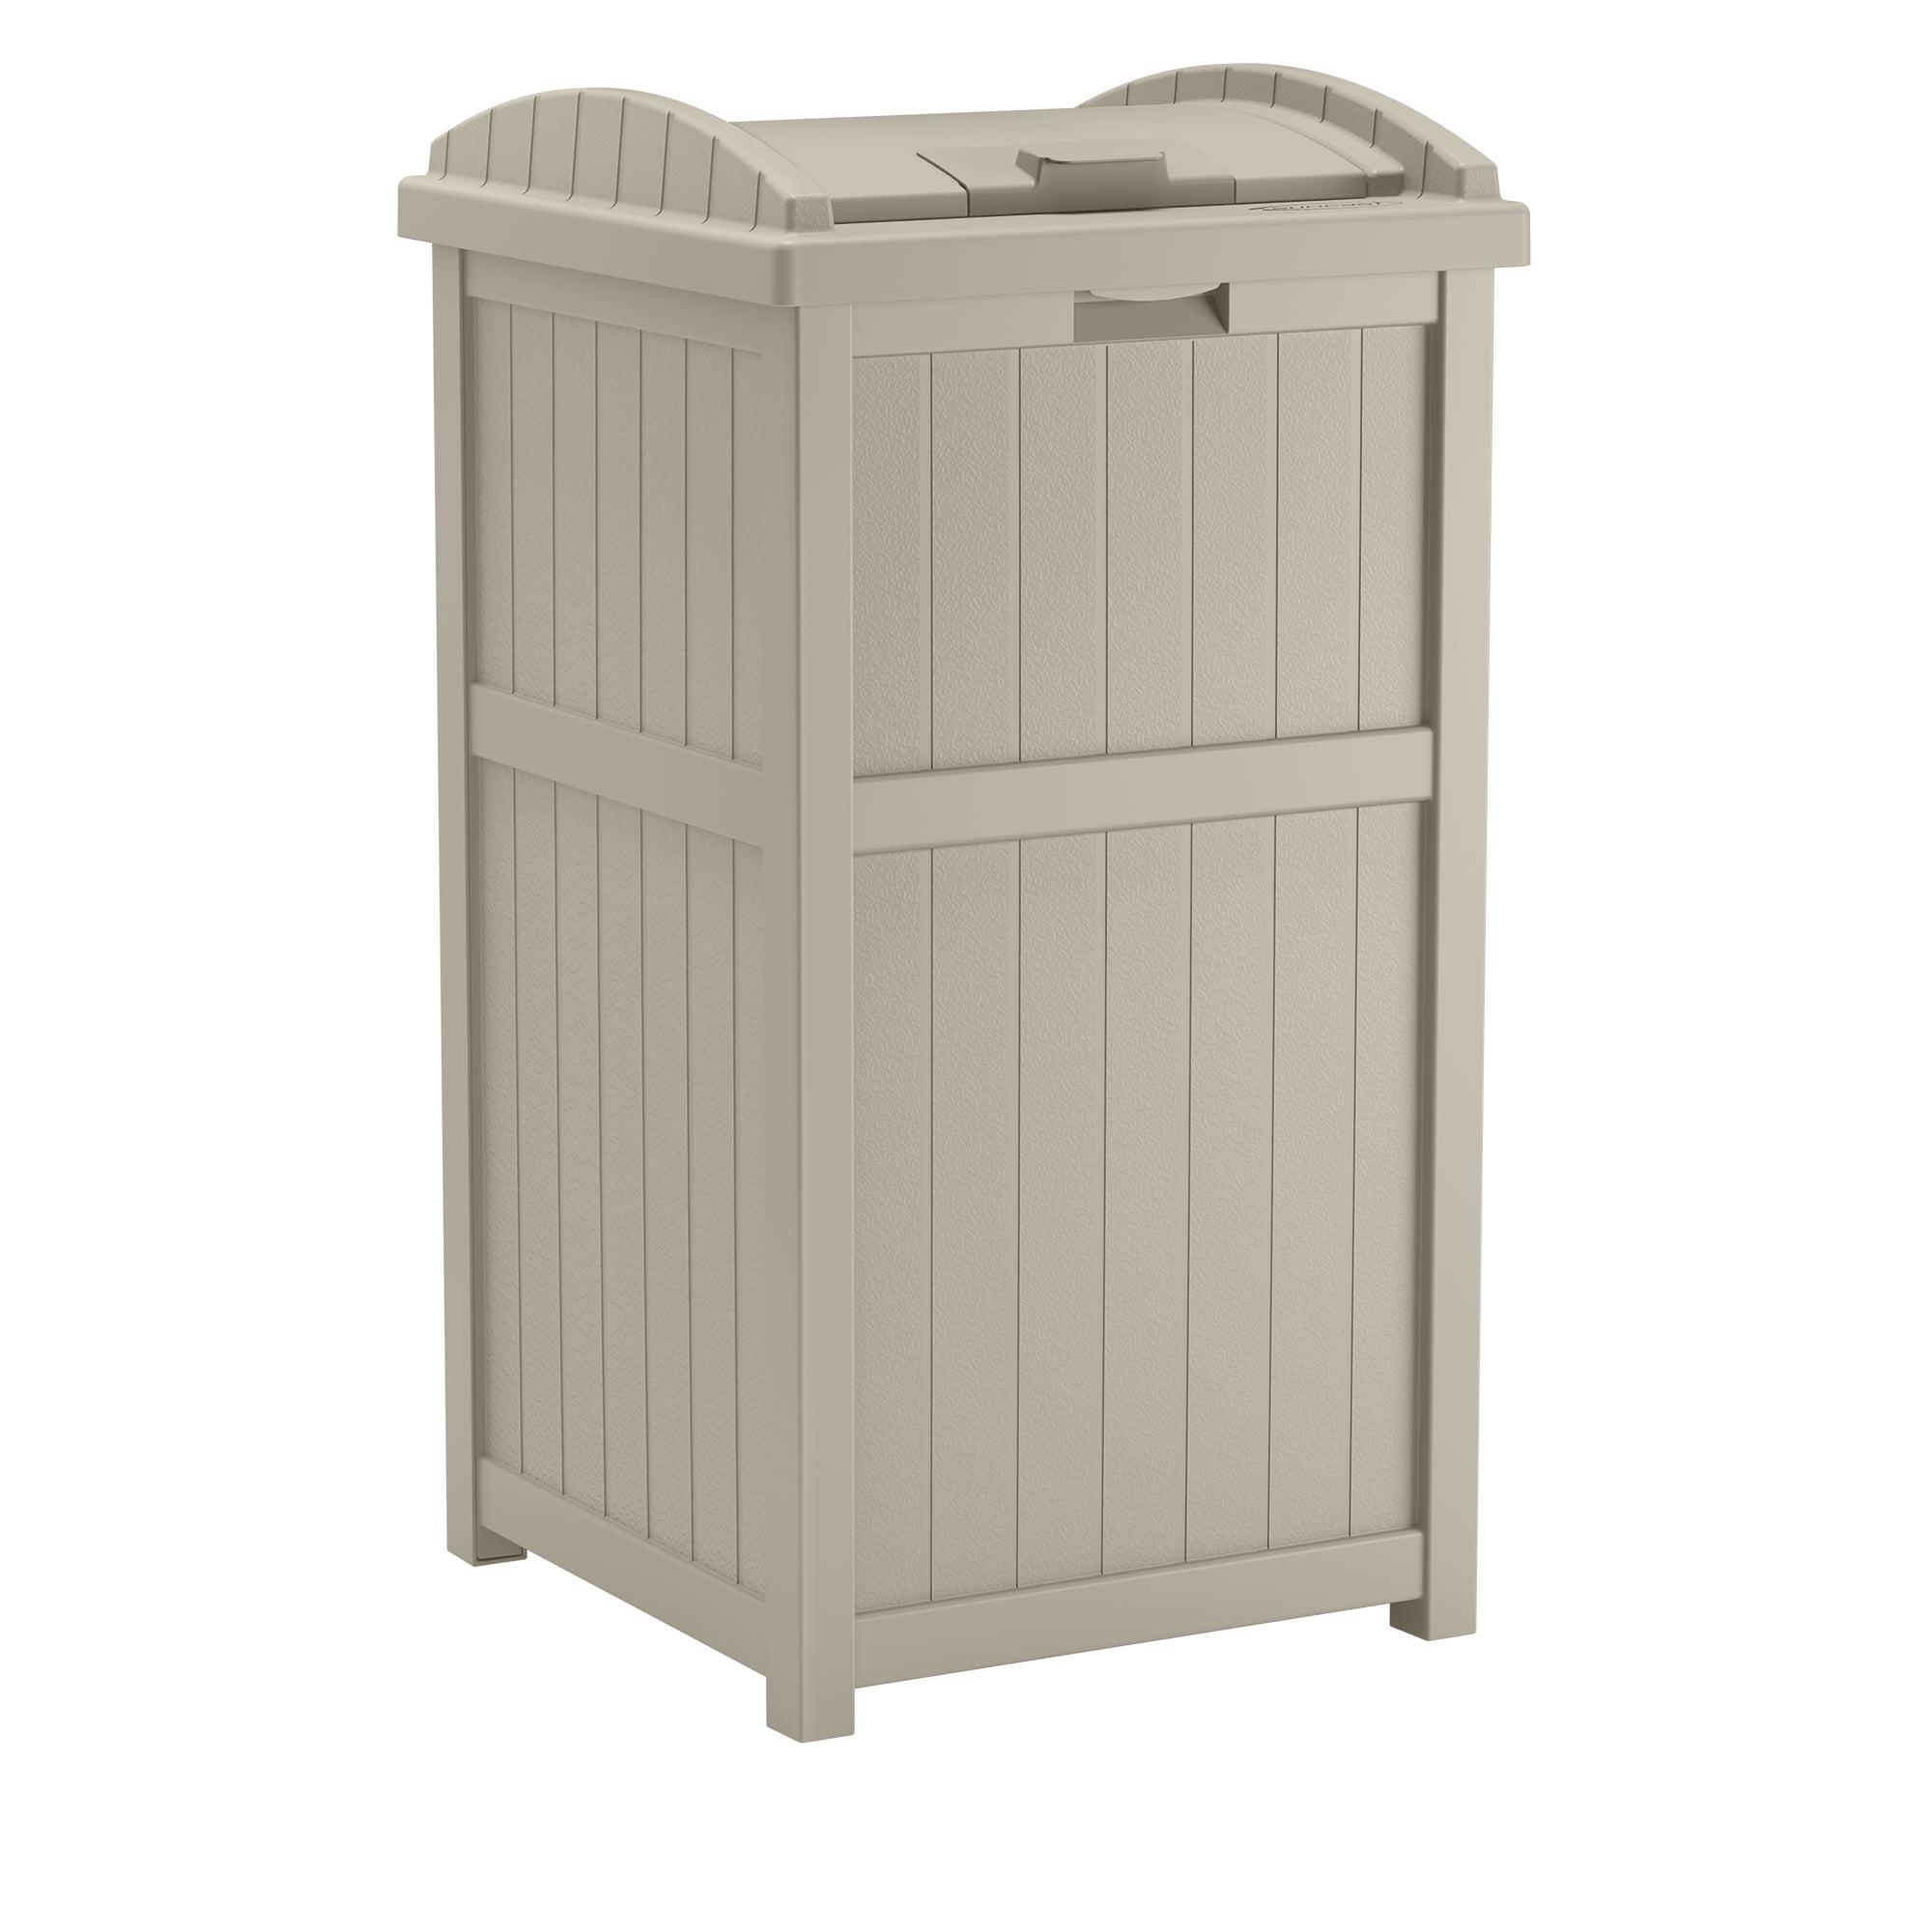 Suncast 33 Gallon Outdoor Hideaway Trash Container For Patio Taupe Walmart Com Walmart Com